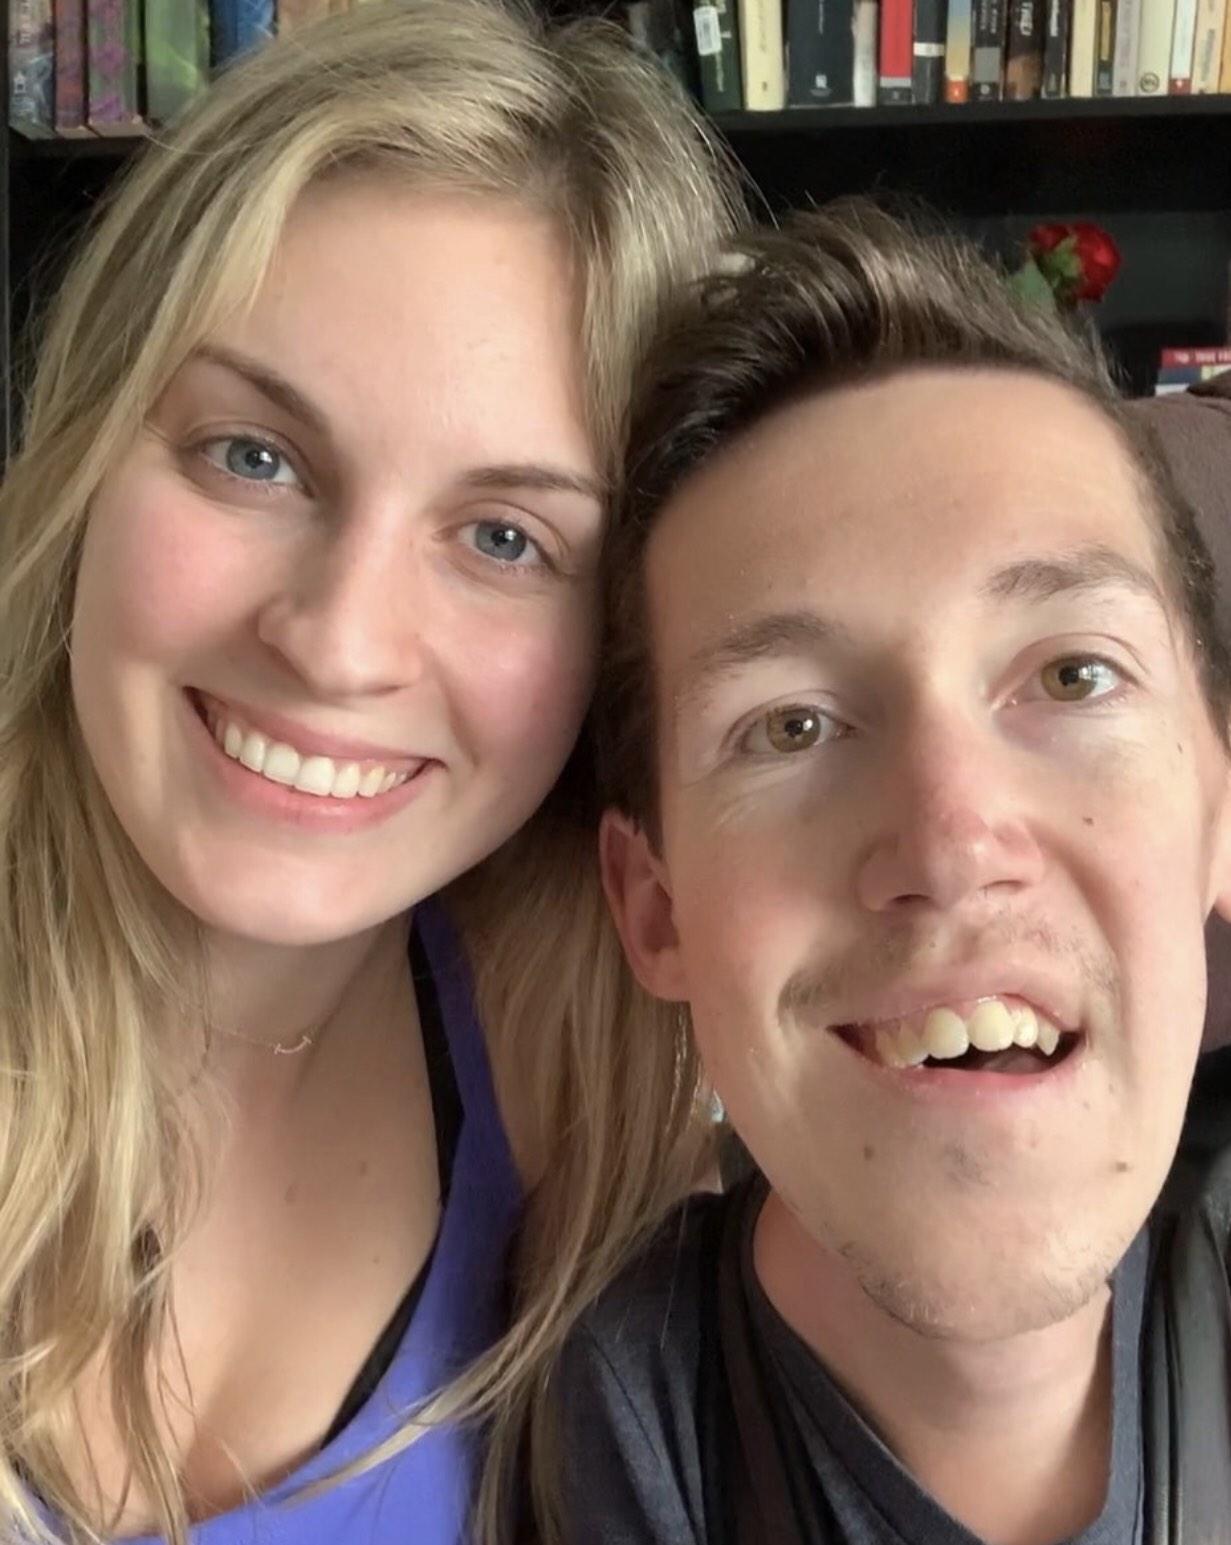 Shane Burcaw and Hannah Burcaw